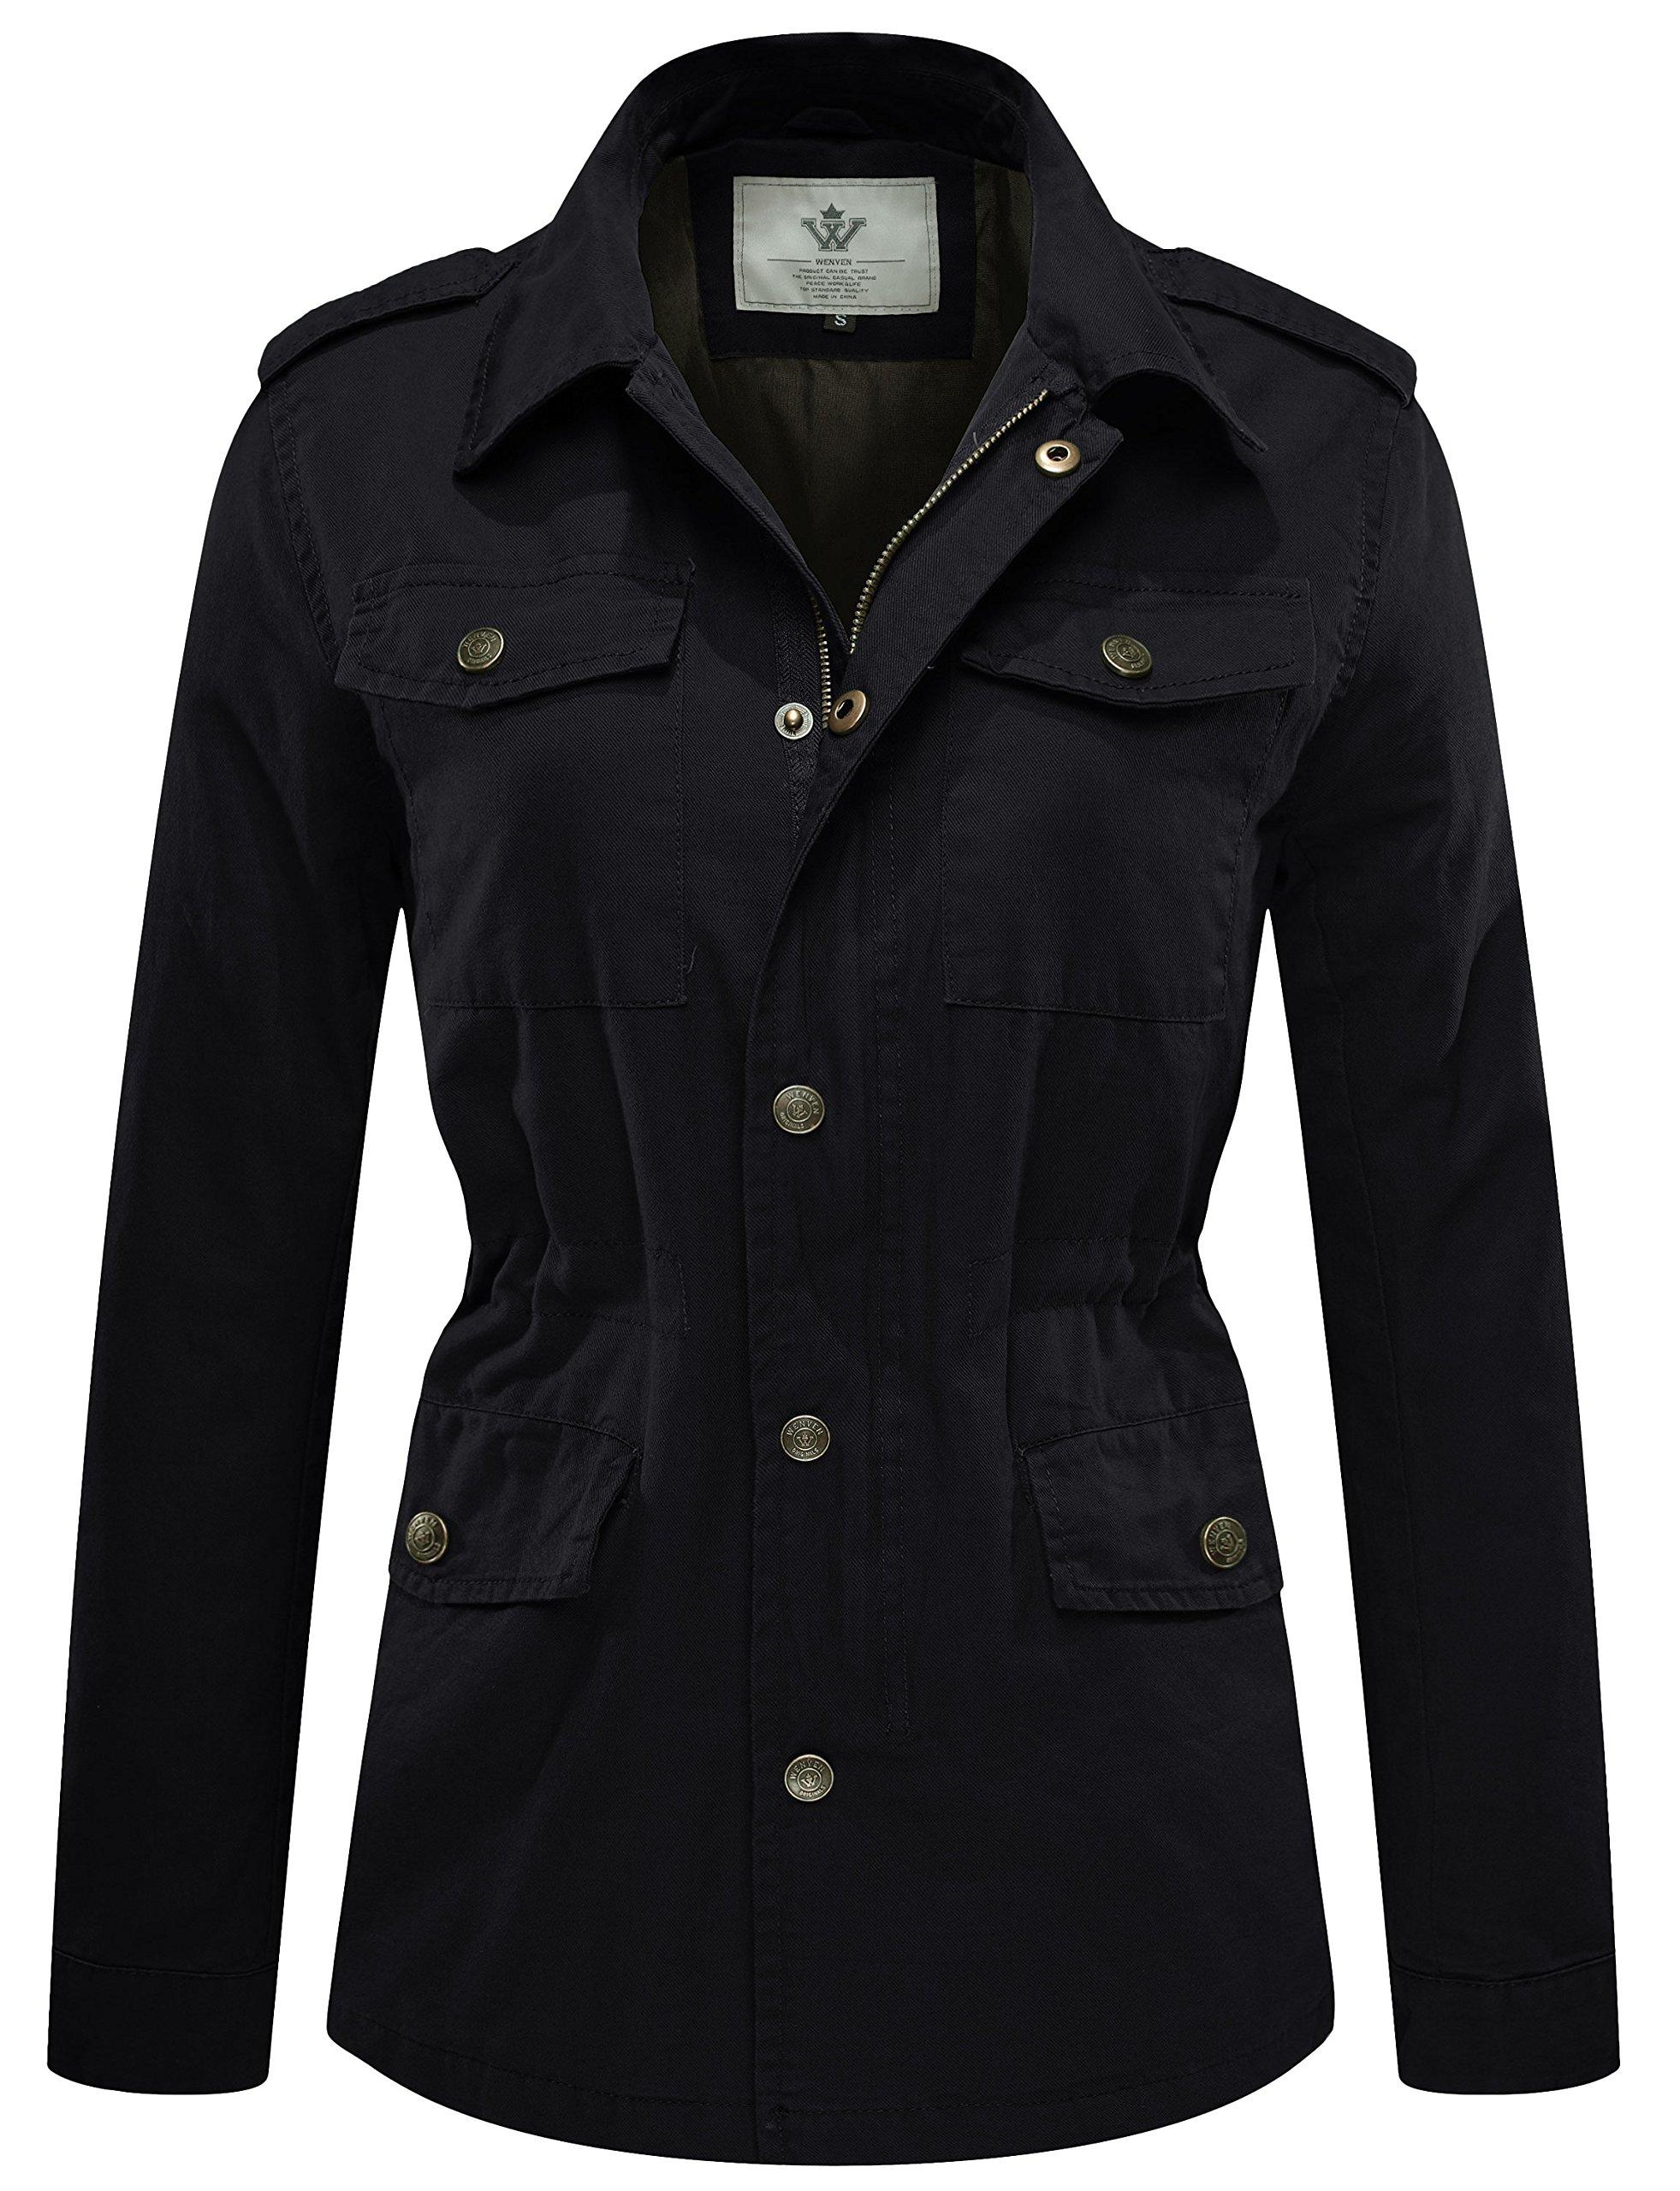 WenVen Women's Anorak Utility Safari Military Jacket Pockets(Black,X-Large)